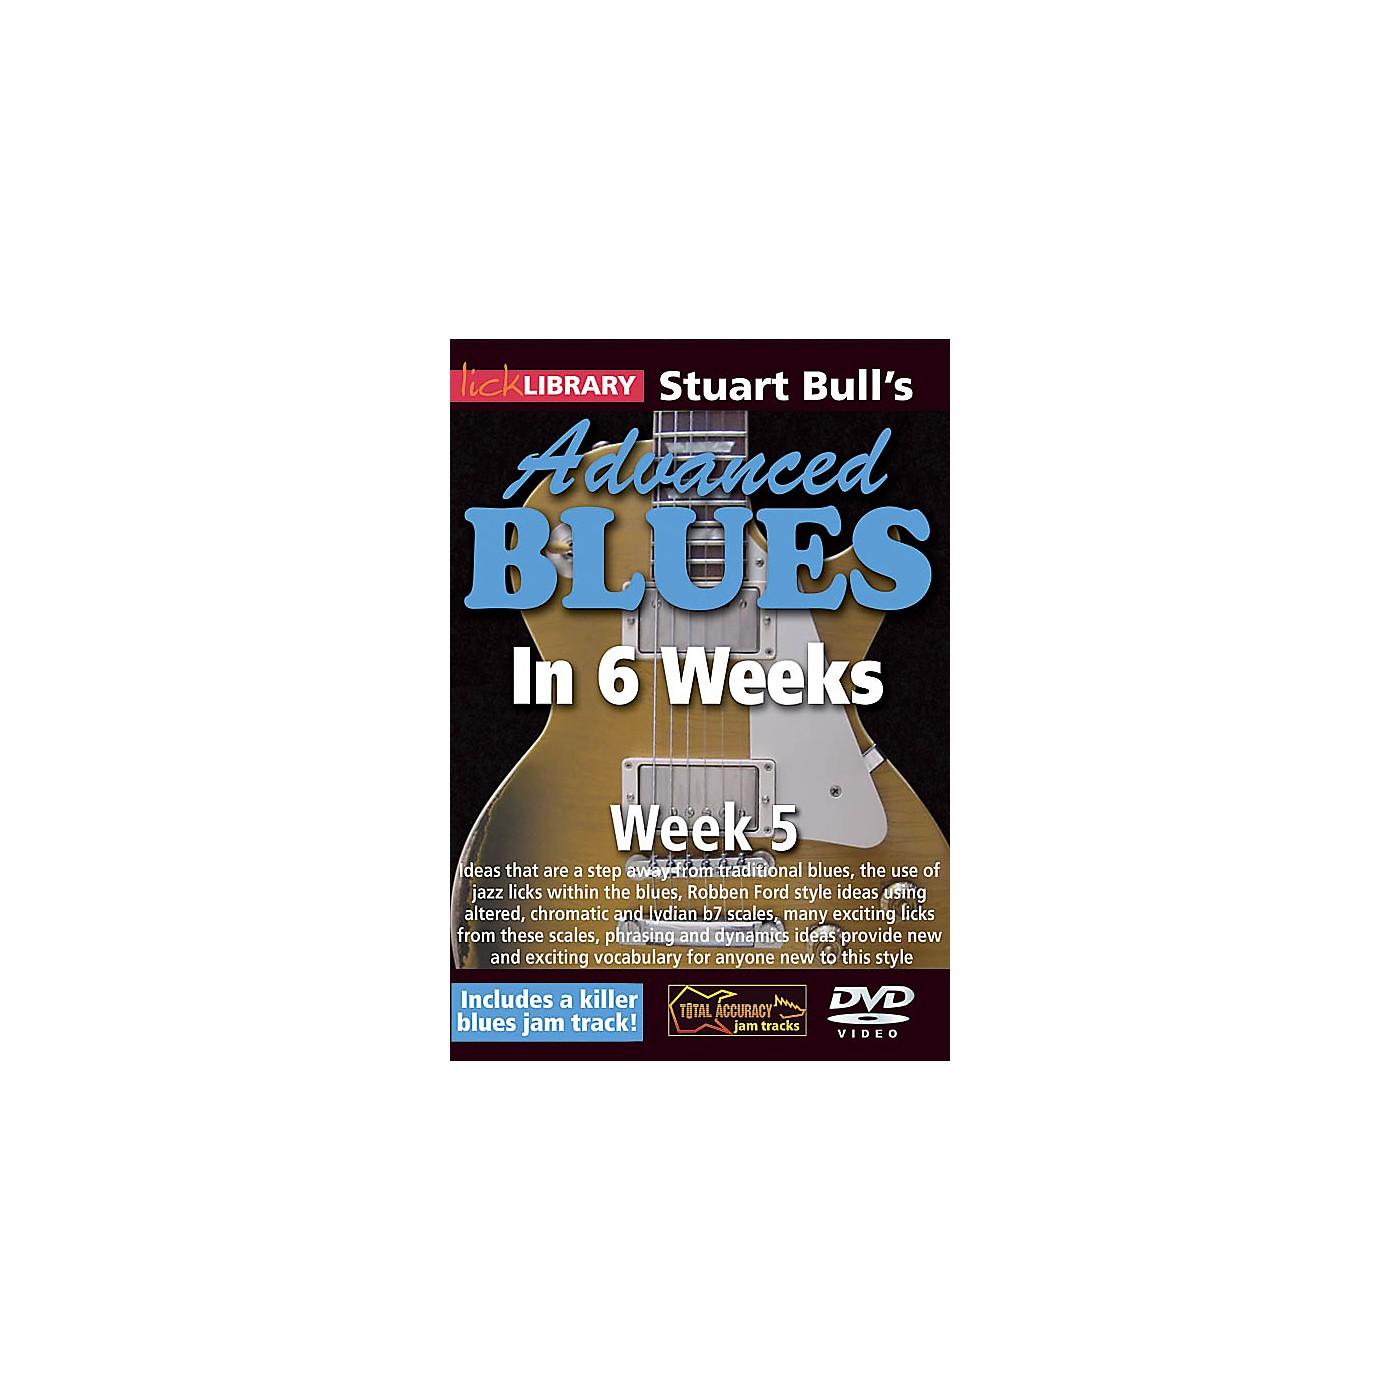 Licklibrary Stuart Bull's Advanced Blues in 6 Weeks (Week 5) Lick Library Series DVD Performed by Stuart Bull thumbnail